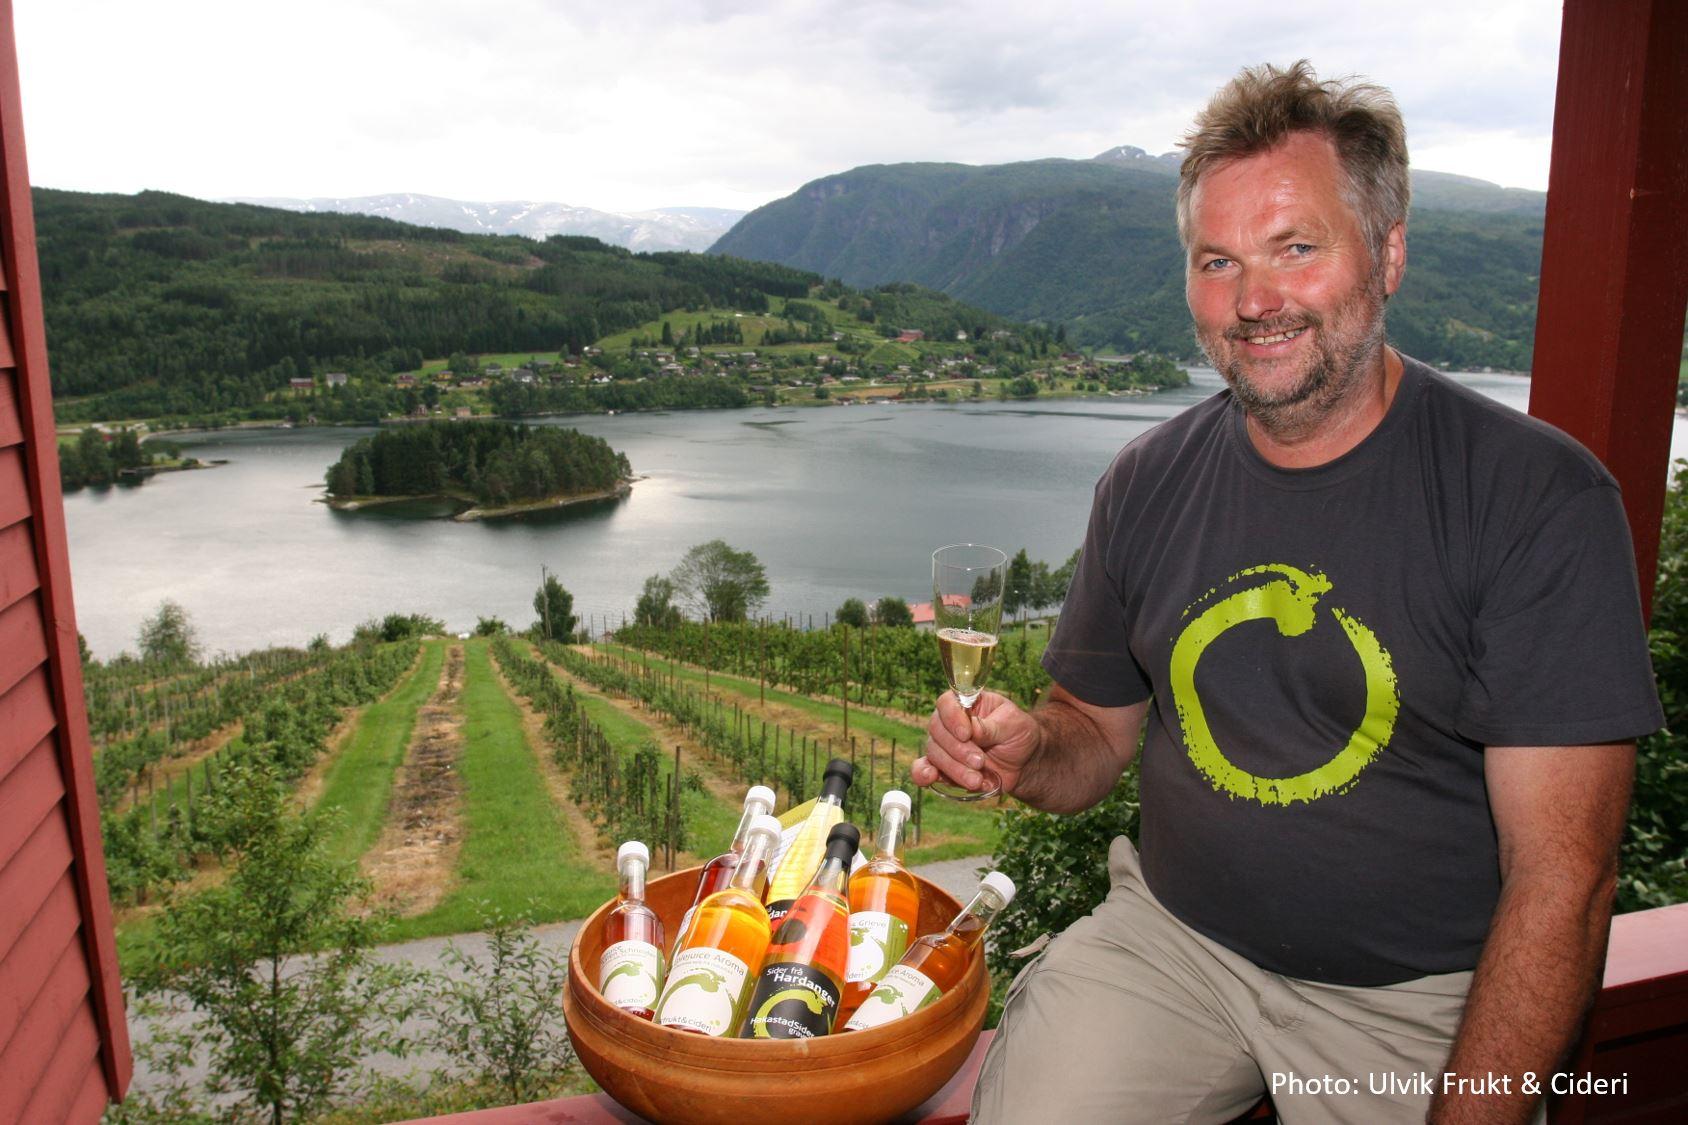 © Ulvik Frukt & Cideri, Travel like the locals - Cider in Ulvik